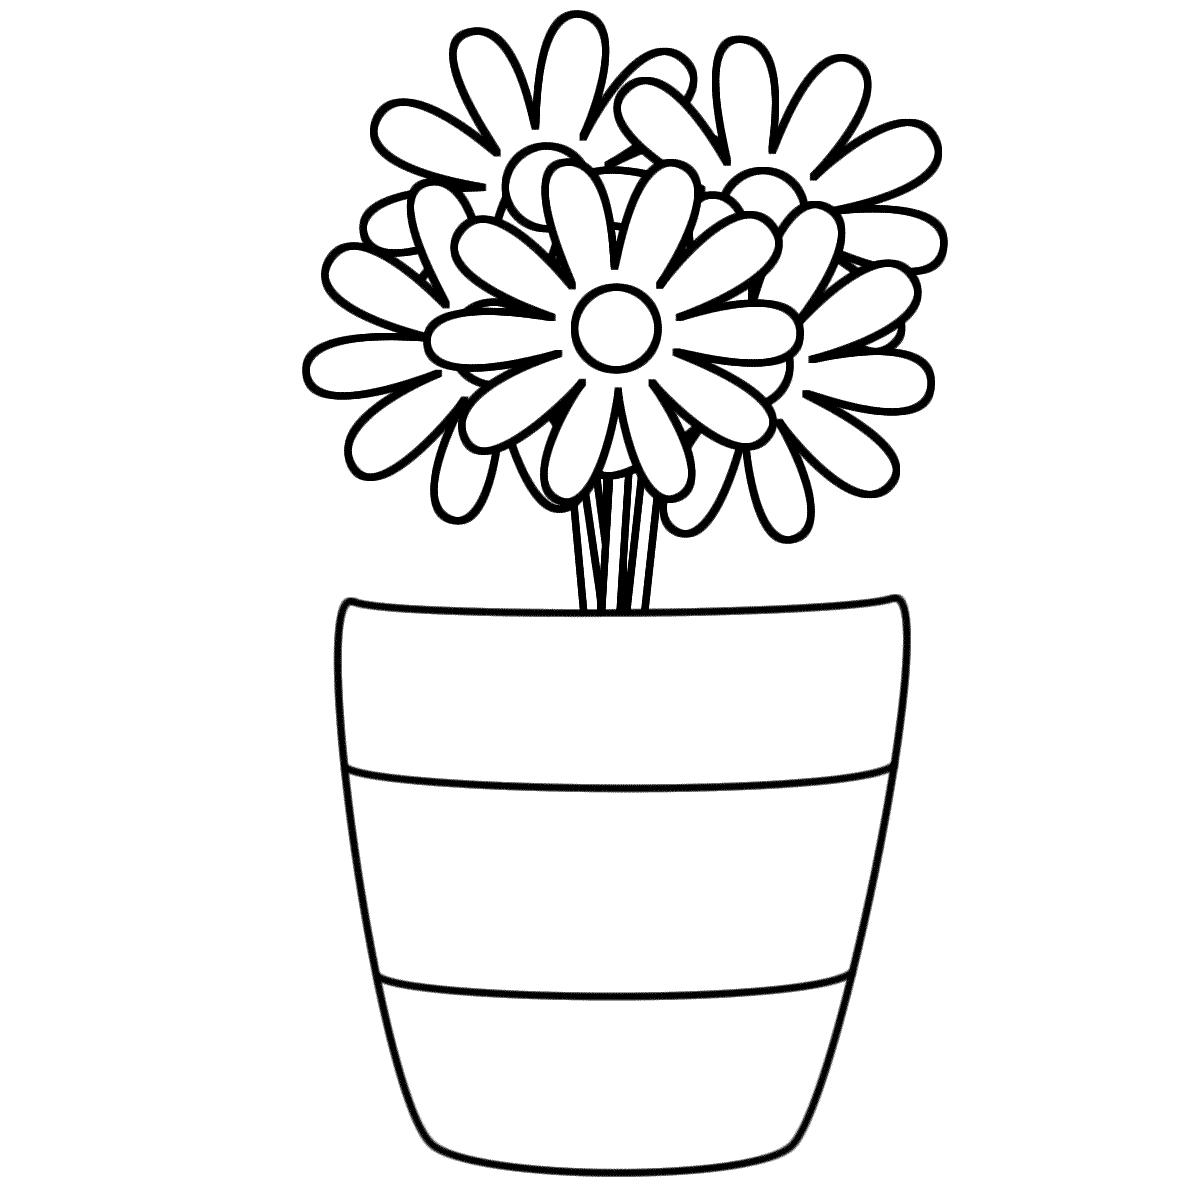 1200x1200 Outline Picture Of Flower Vase Flower Vase Drawing Images Drawing